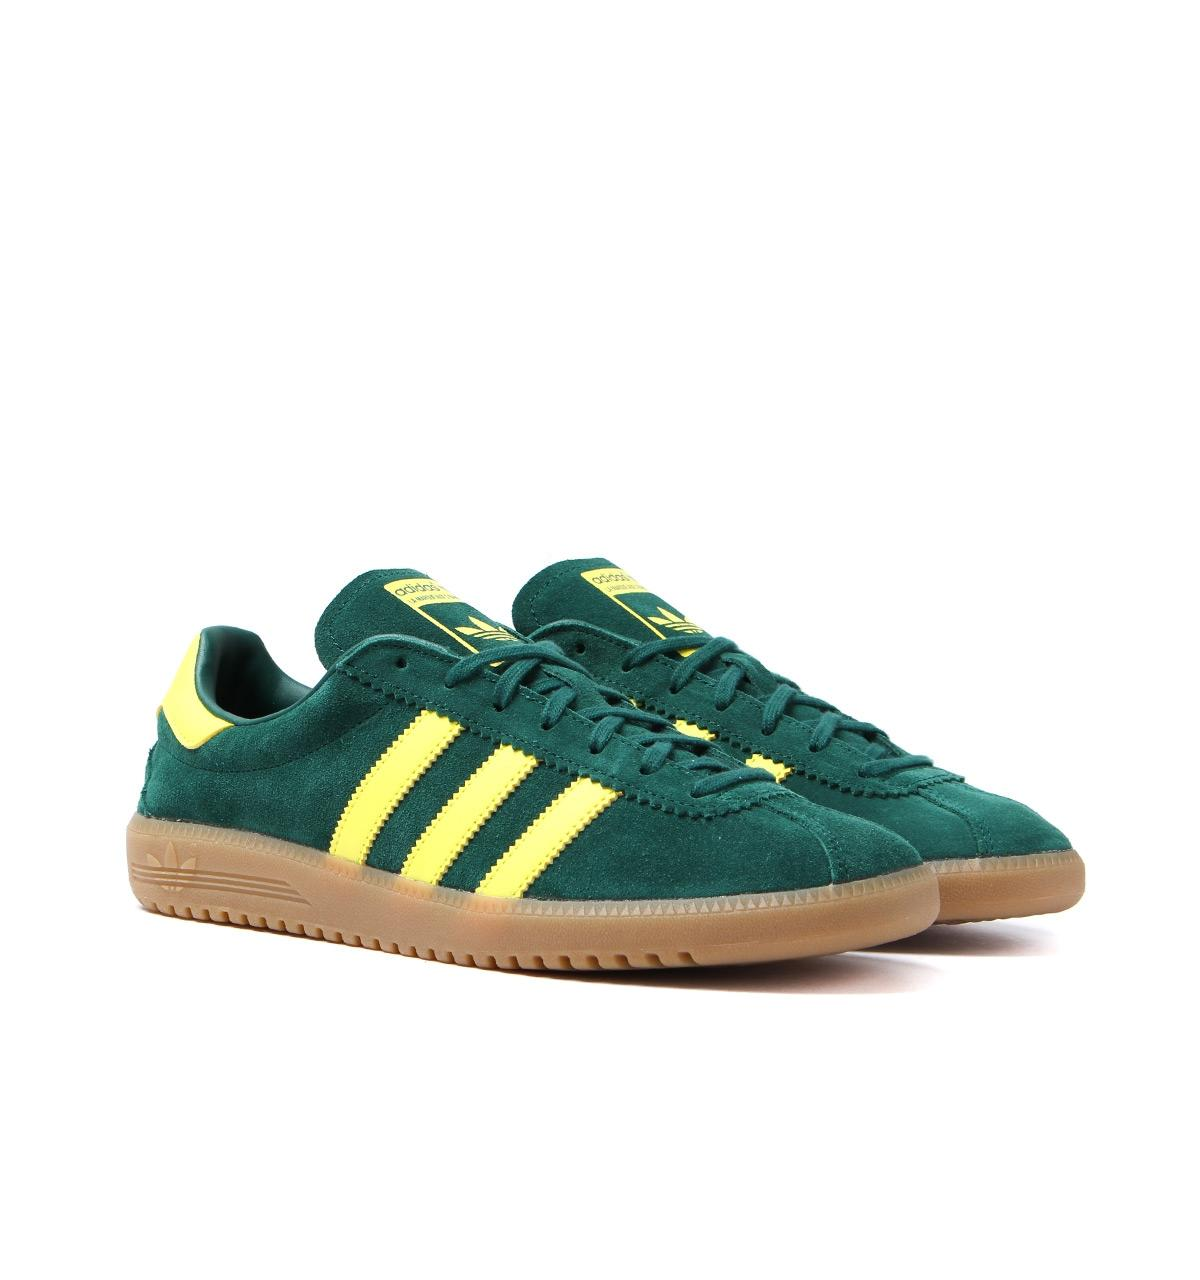 Adidas Originals Bermuda Collegiate Green   Shock Yellow Trainers in ... 0d6fd8fe4